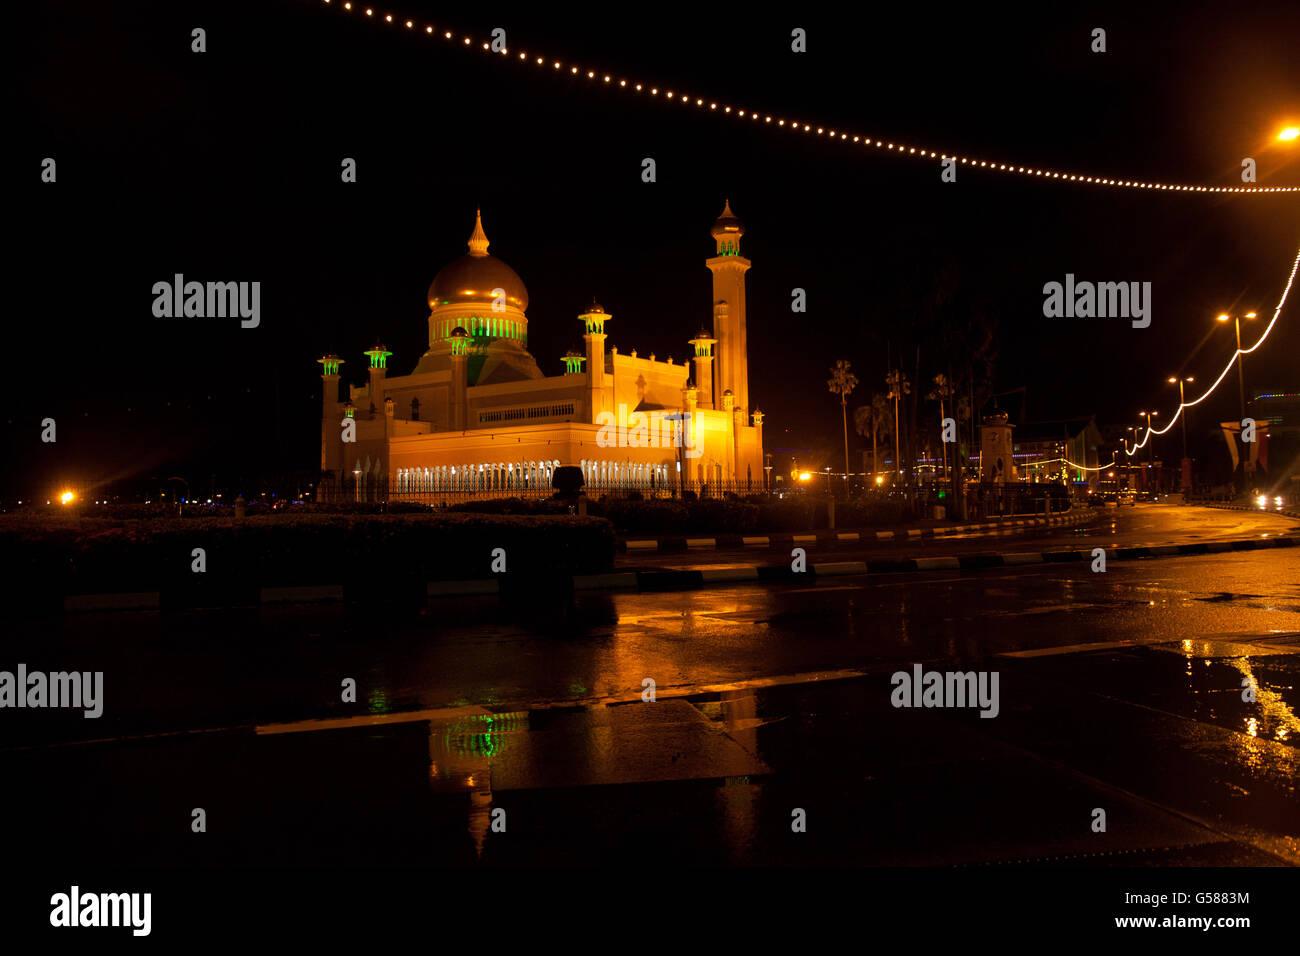 Sultan Omar Ali Saifuddin Mosque and Street - Stock Image